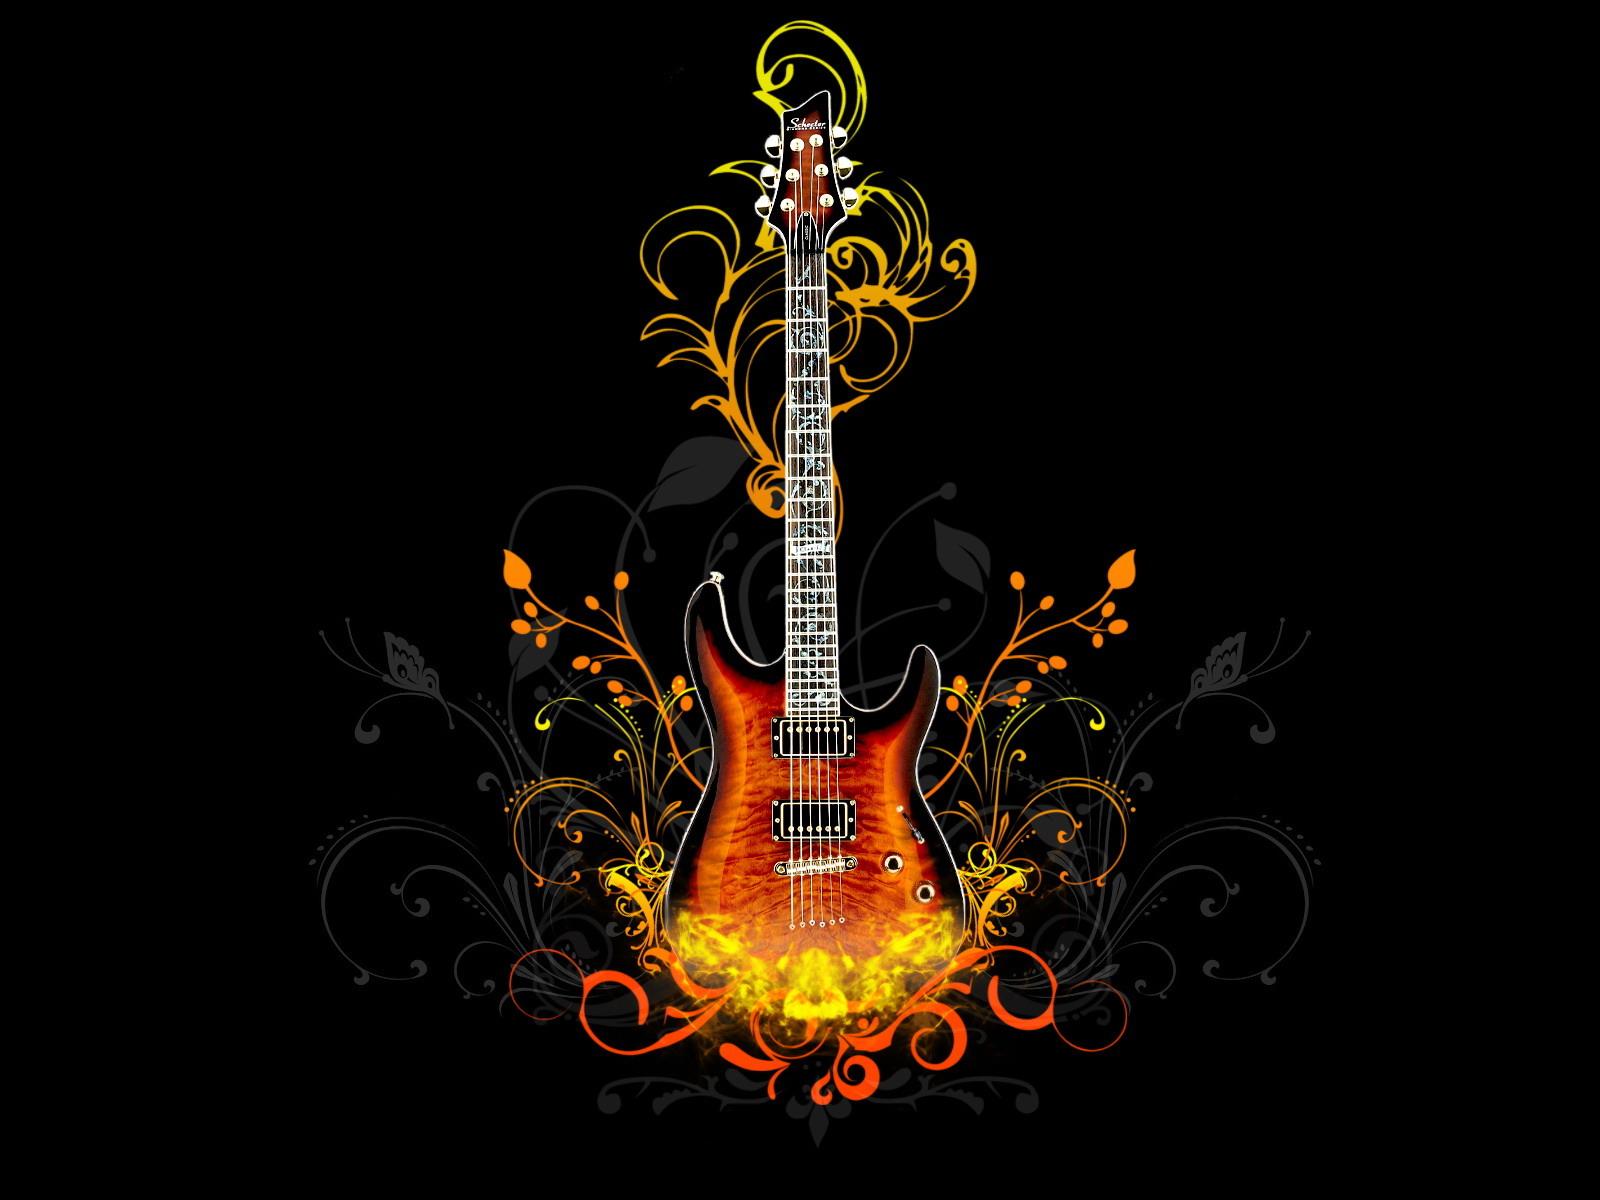 Music - Artistic  Wallpaper